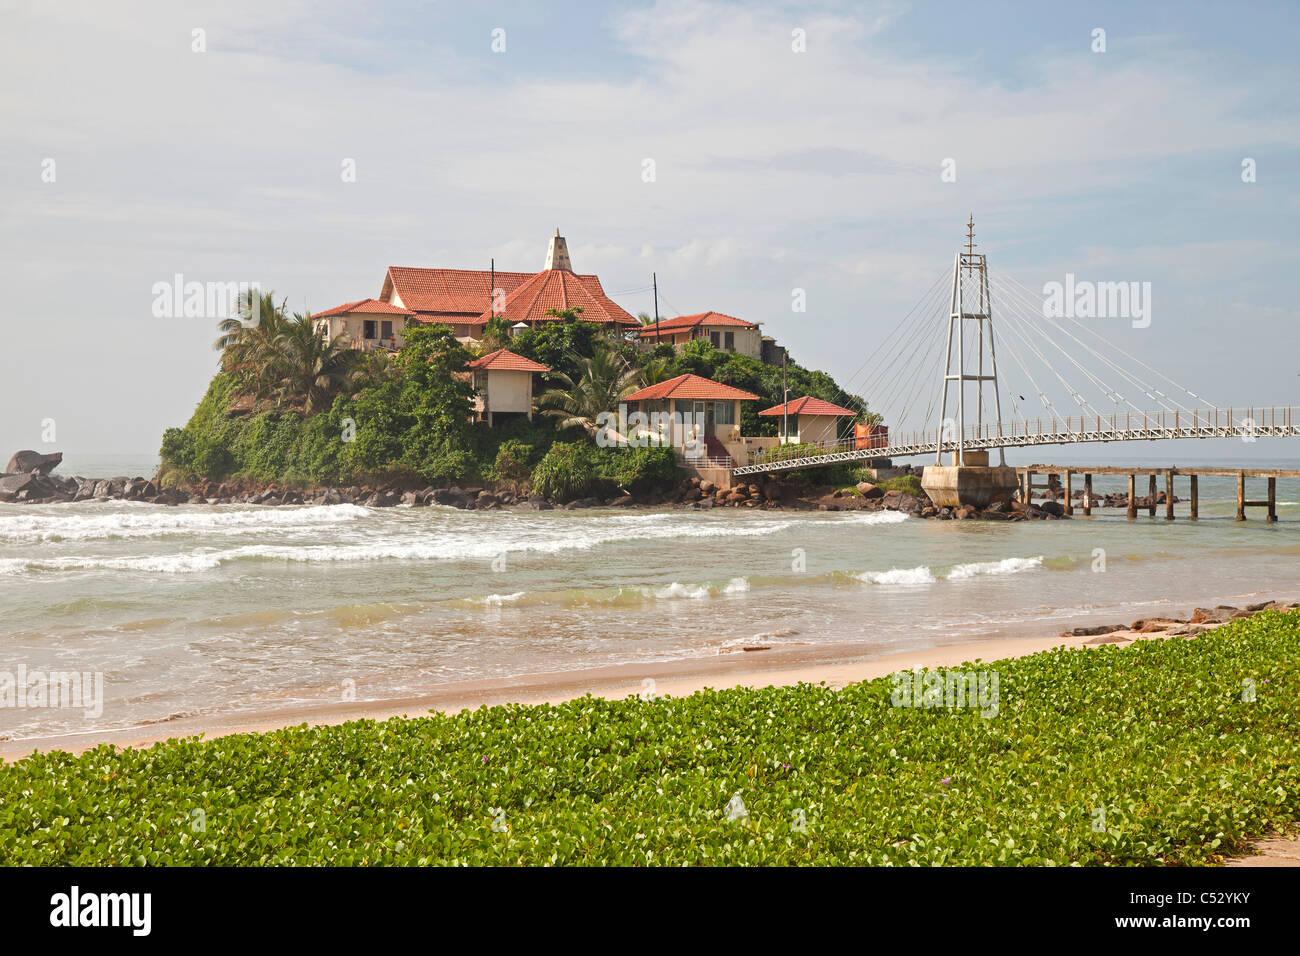 Parey Duwa Buddhist Temple on a small island close to Matara, Sri Lanka, Asia - Stock Image